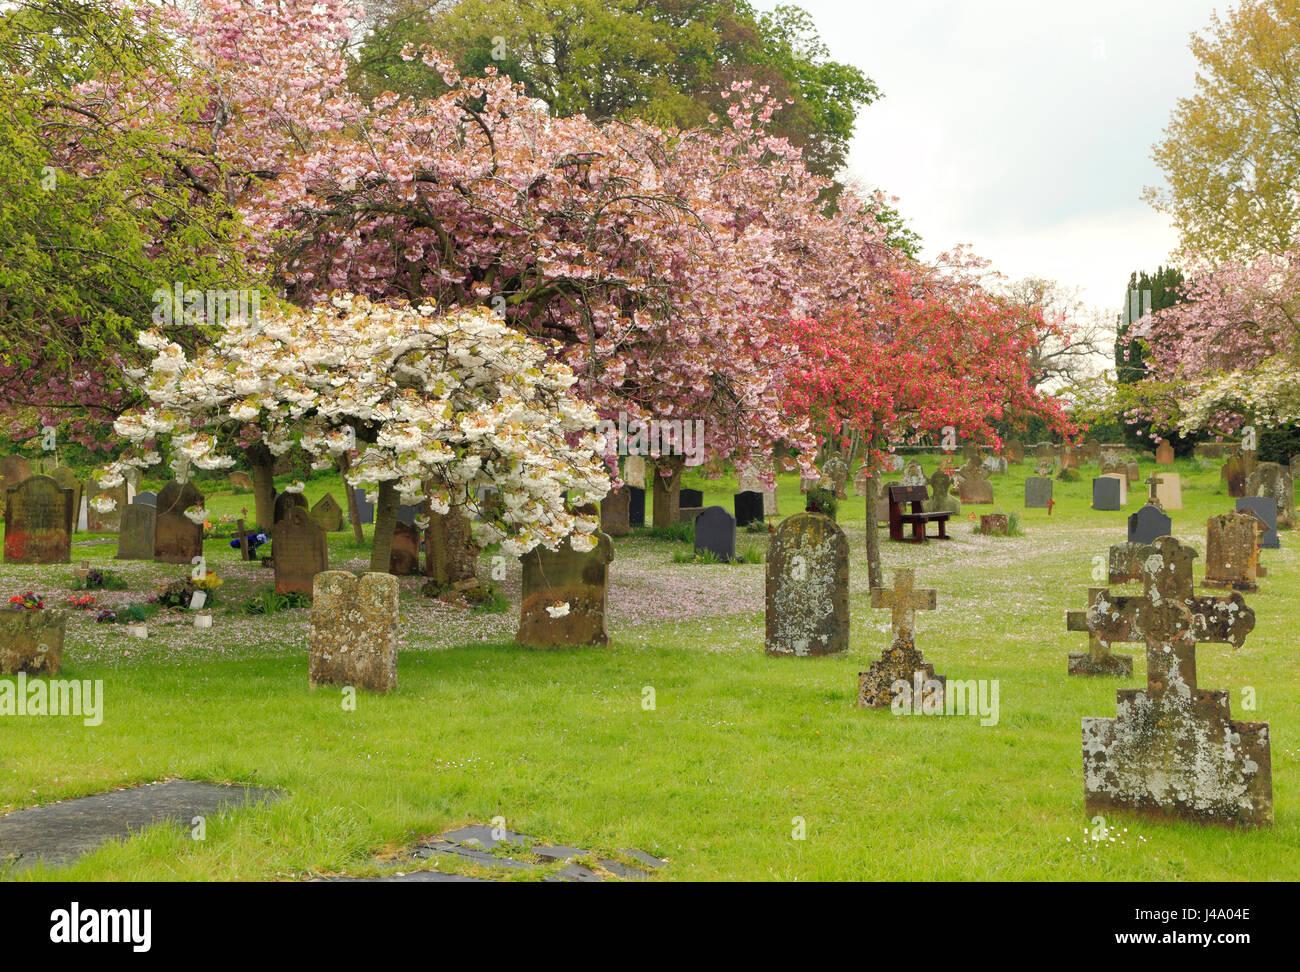 Peaceful village churchyard, gravestones, cherry blossom, Sculthorpe Norfolk UK - Stock Image